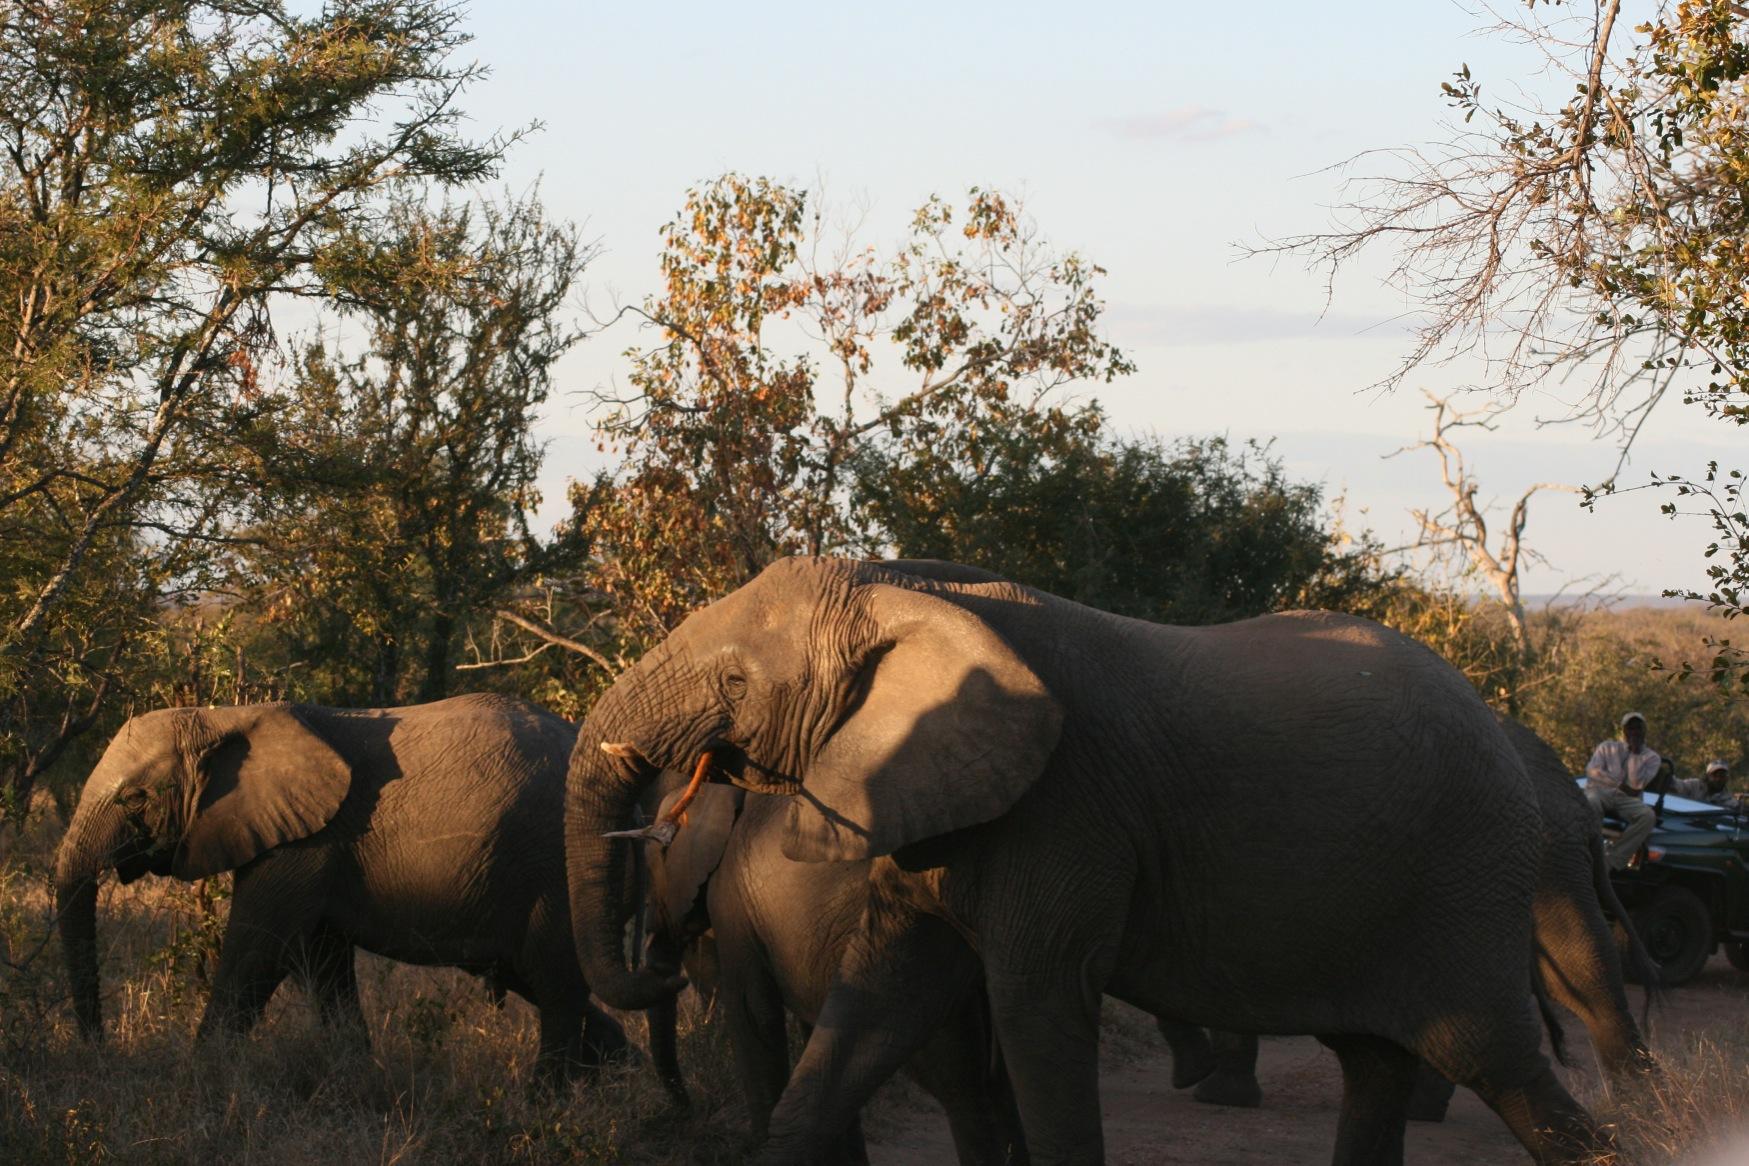 Sth Africa Elephants.jpg